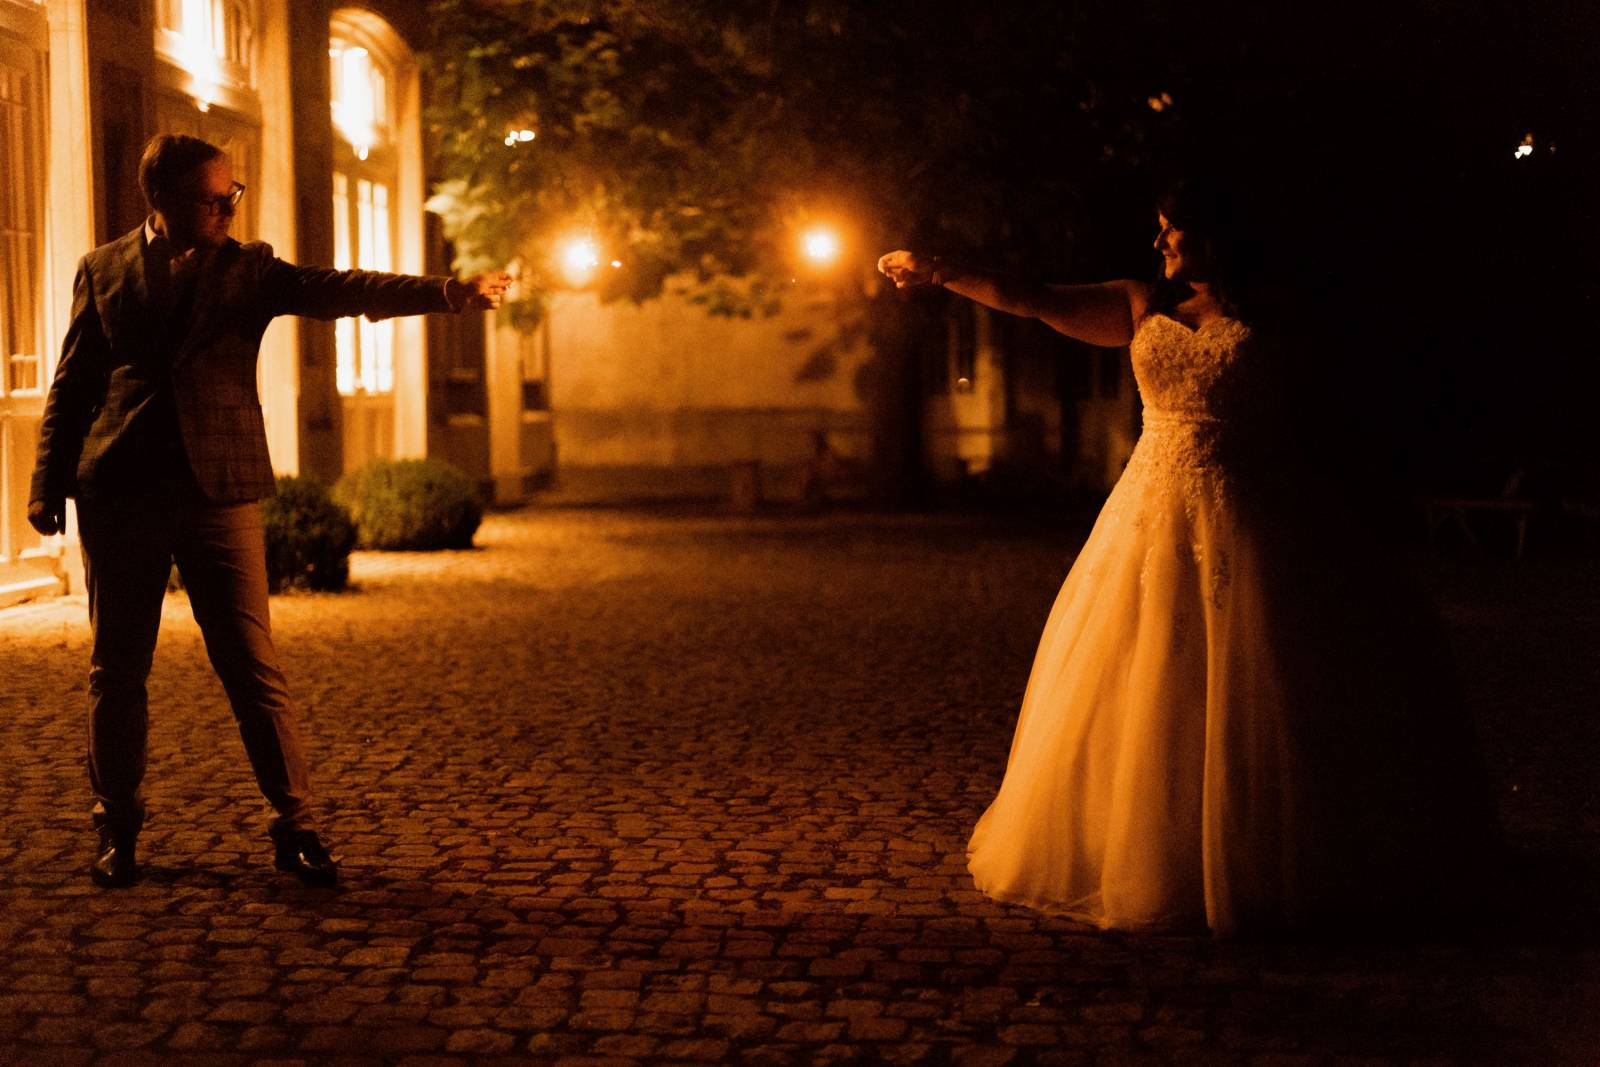 Kasteel Den Brandt - Feestzaal - Trouwzaal - Kasteel - House of Weddings - 16